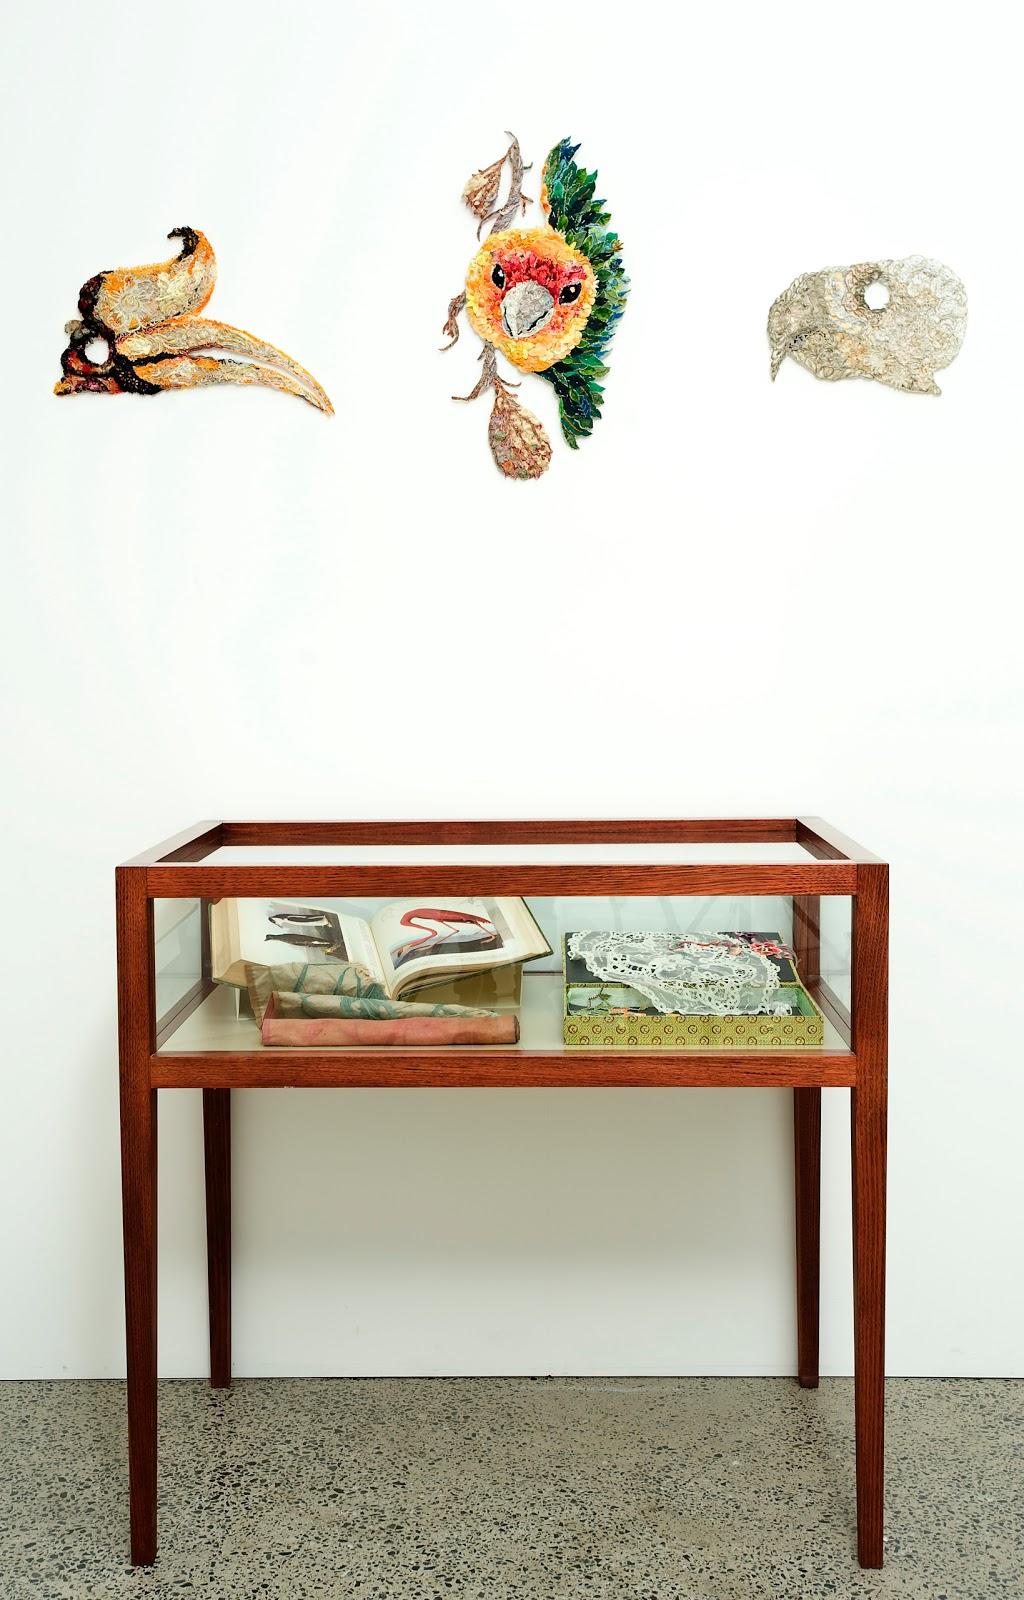 Lou Saxton artspace